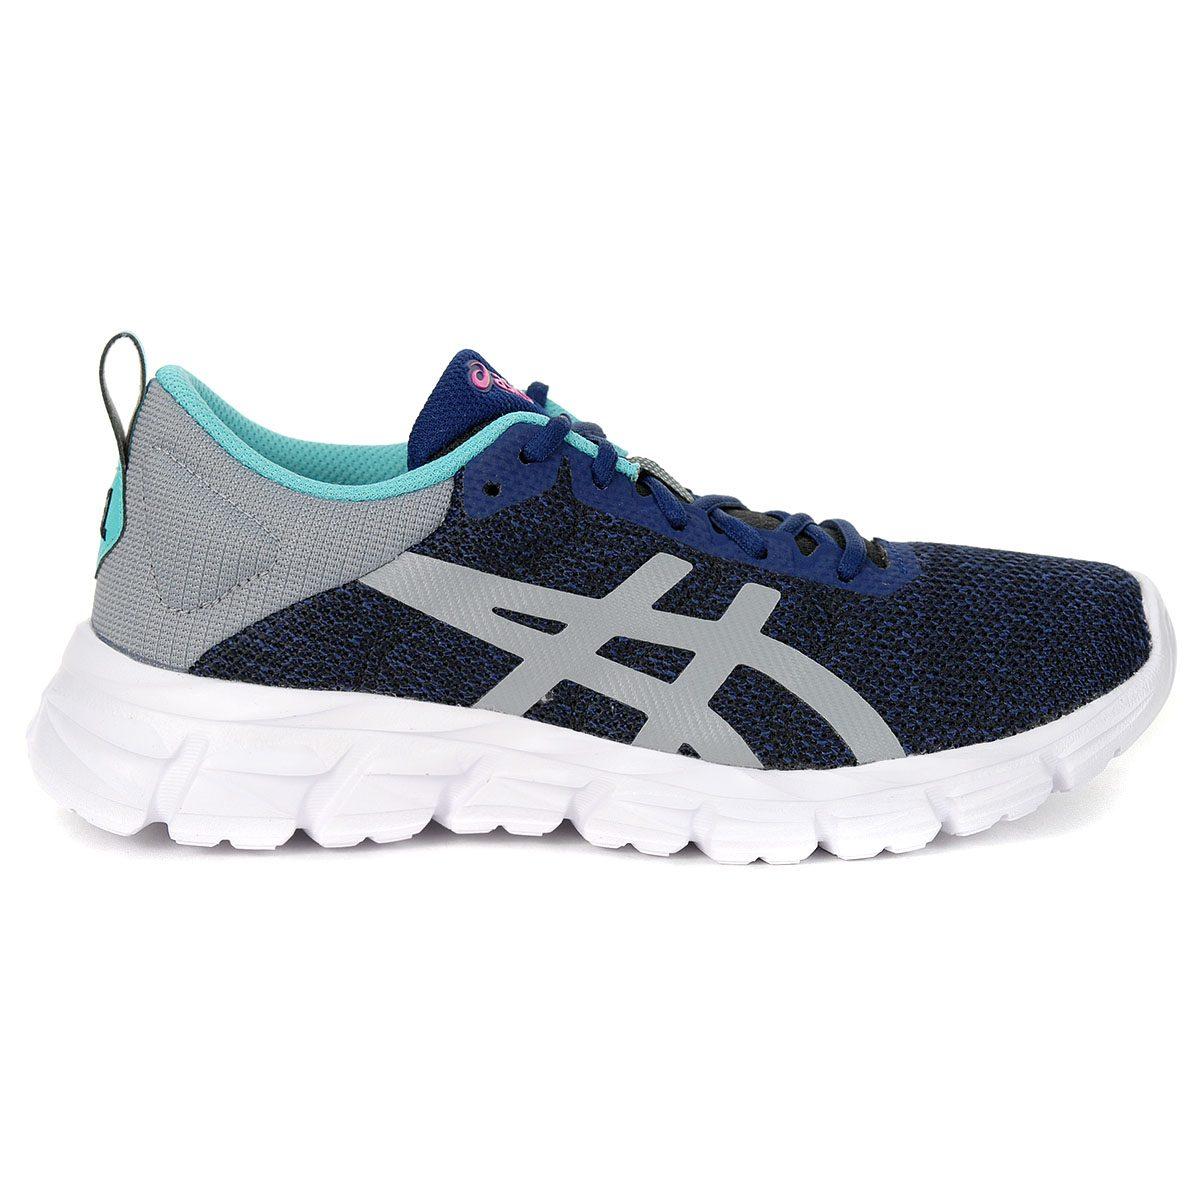 ASICS Women's Gel-Quantum Lyte Running Shoes Blue/Sheet Rock ...